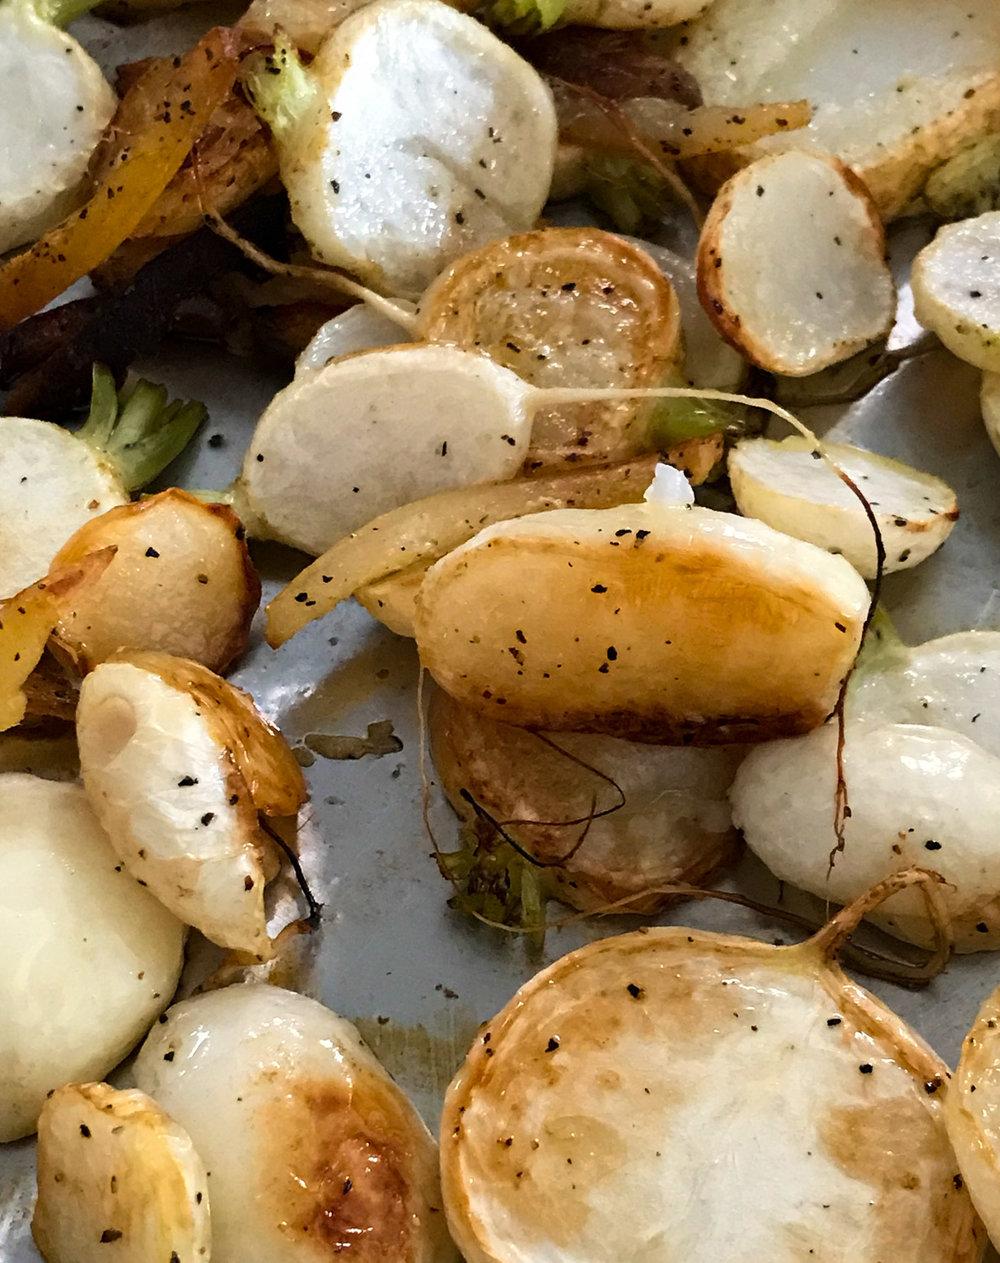 Roasted turnips with preserved lemon.